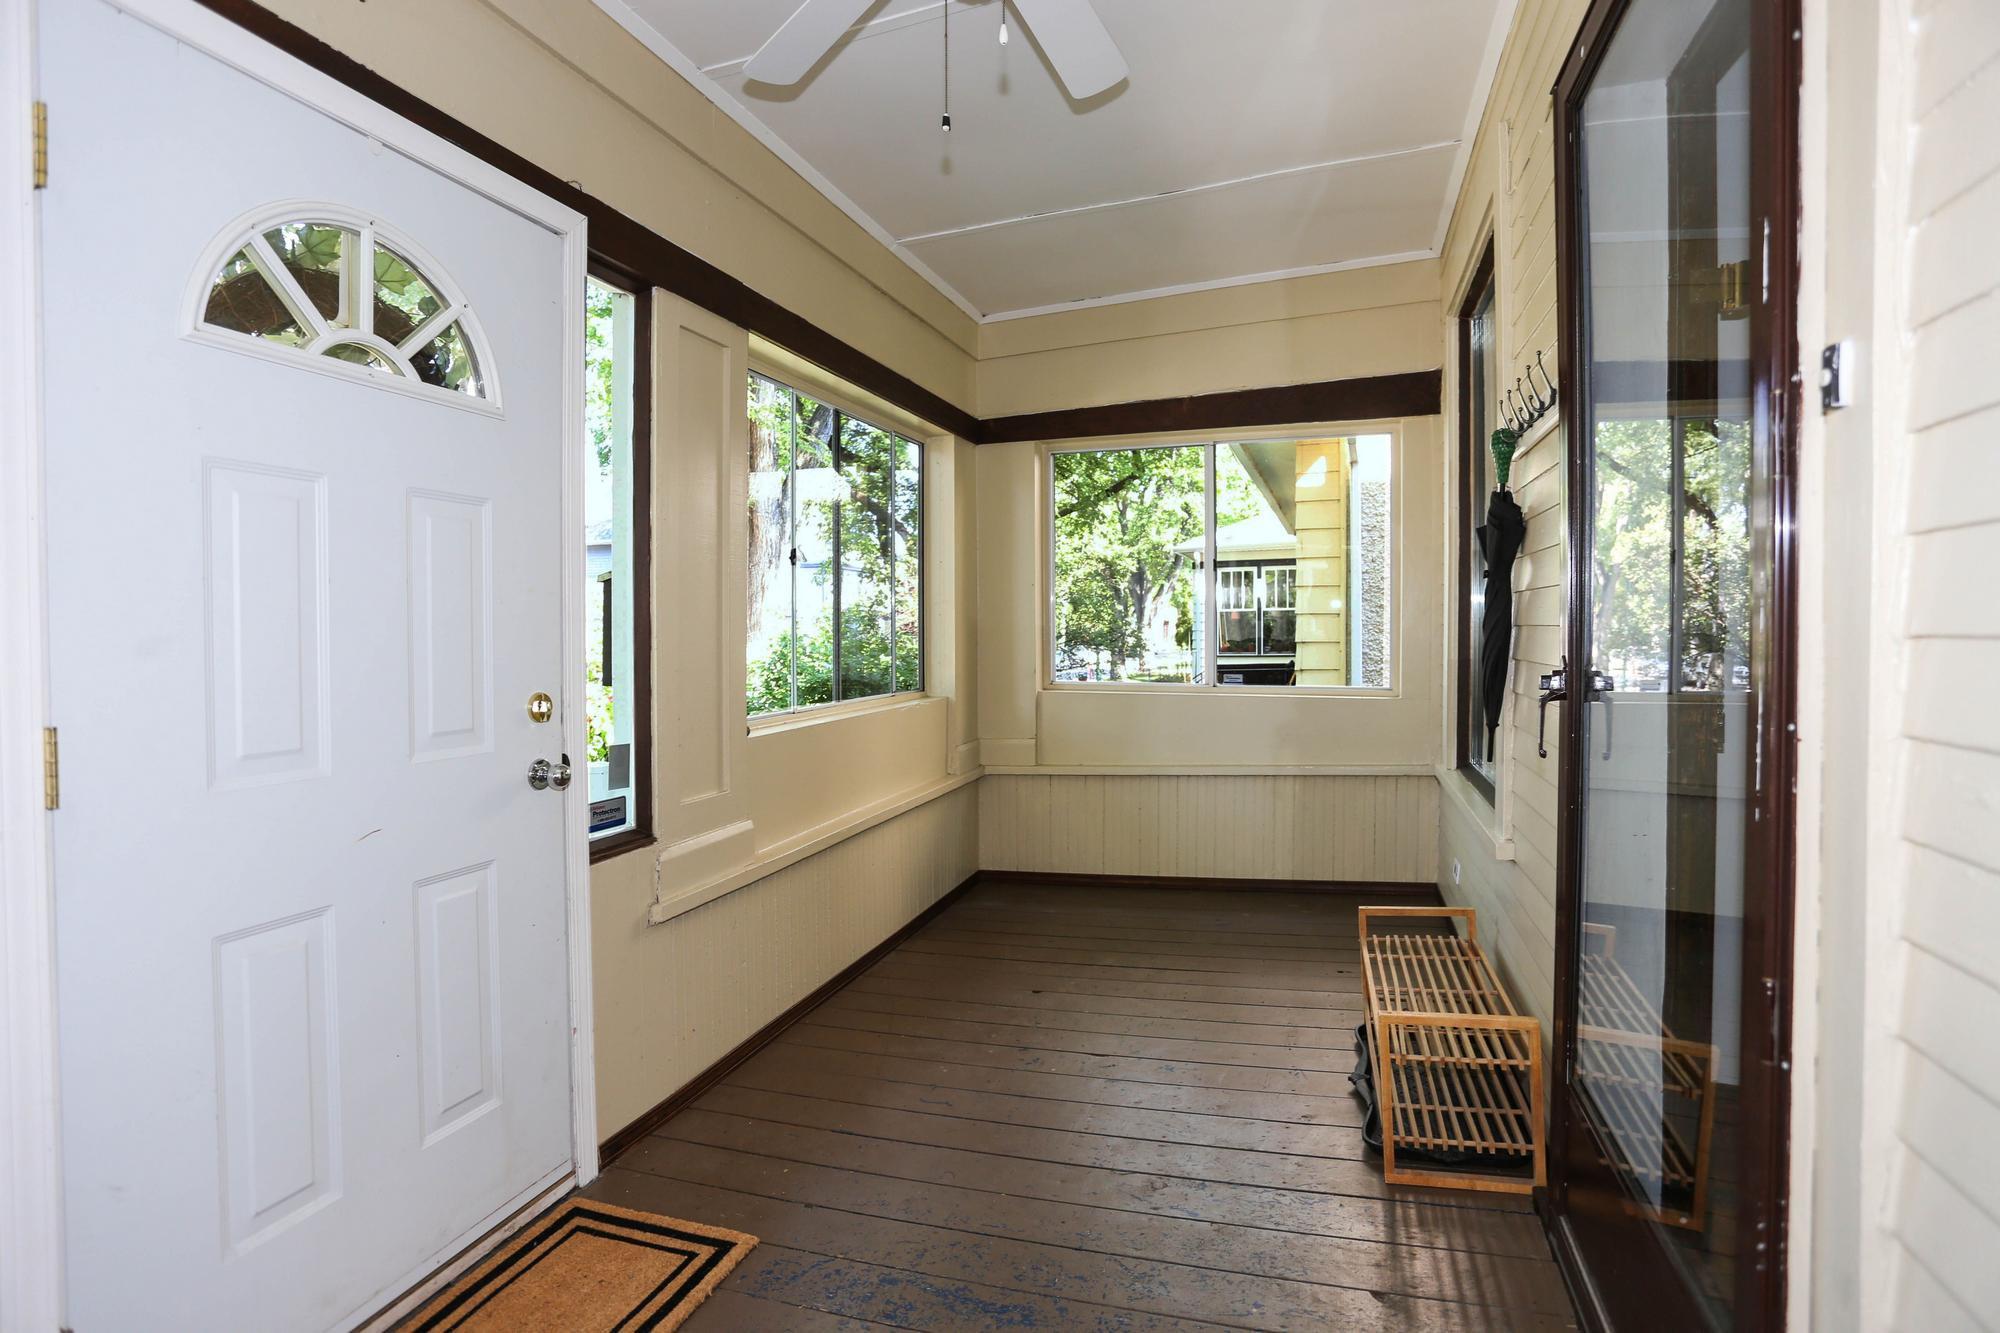 Photo 4: Photos: 105 Evanson Street in Winnipeg: Wolseley Single Family Detached for sale (5B)  : MLS®# 1821900